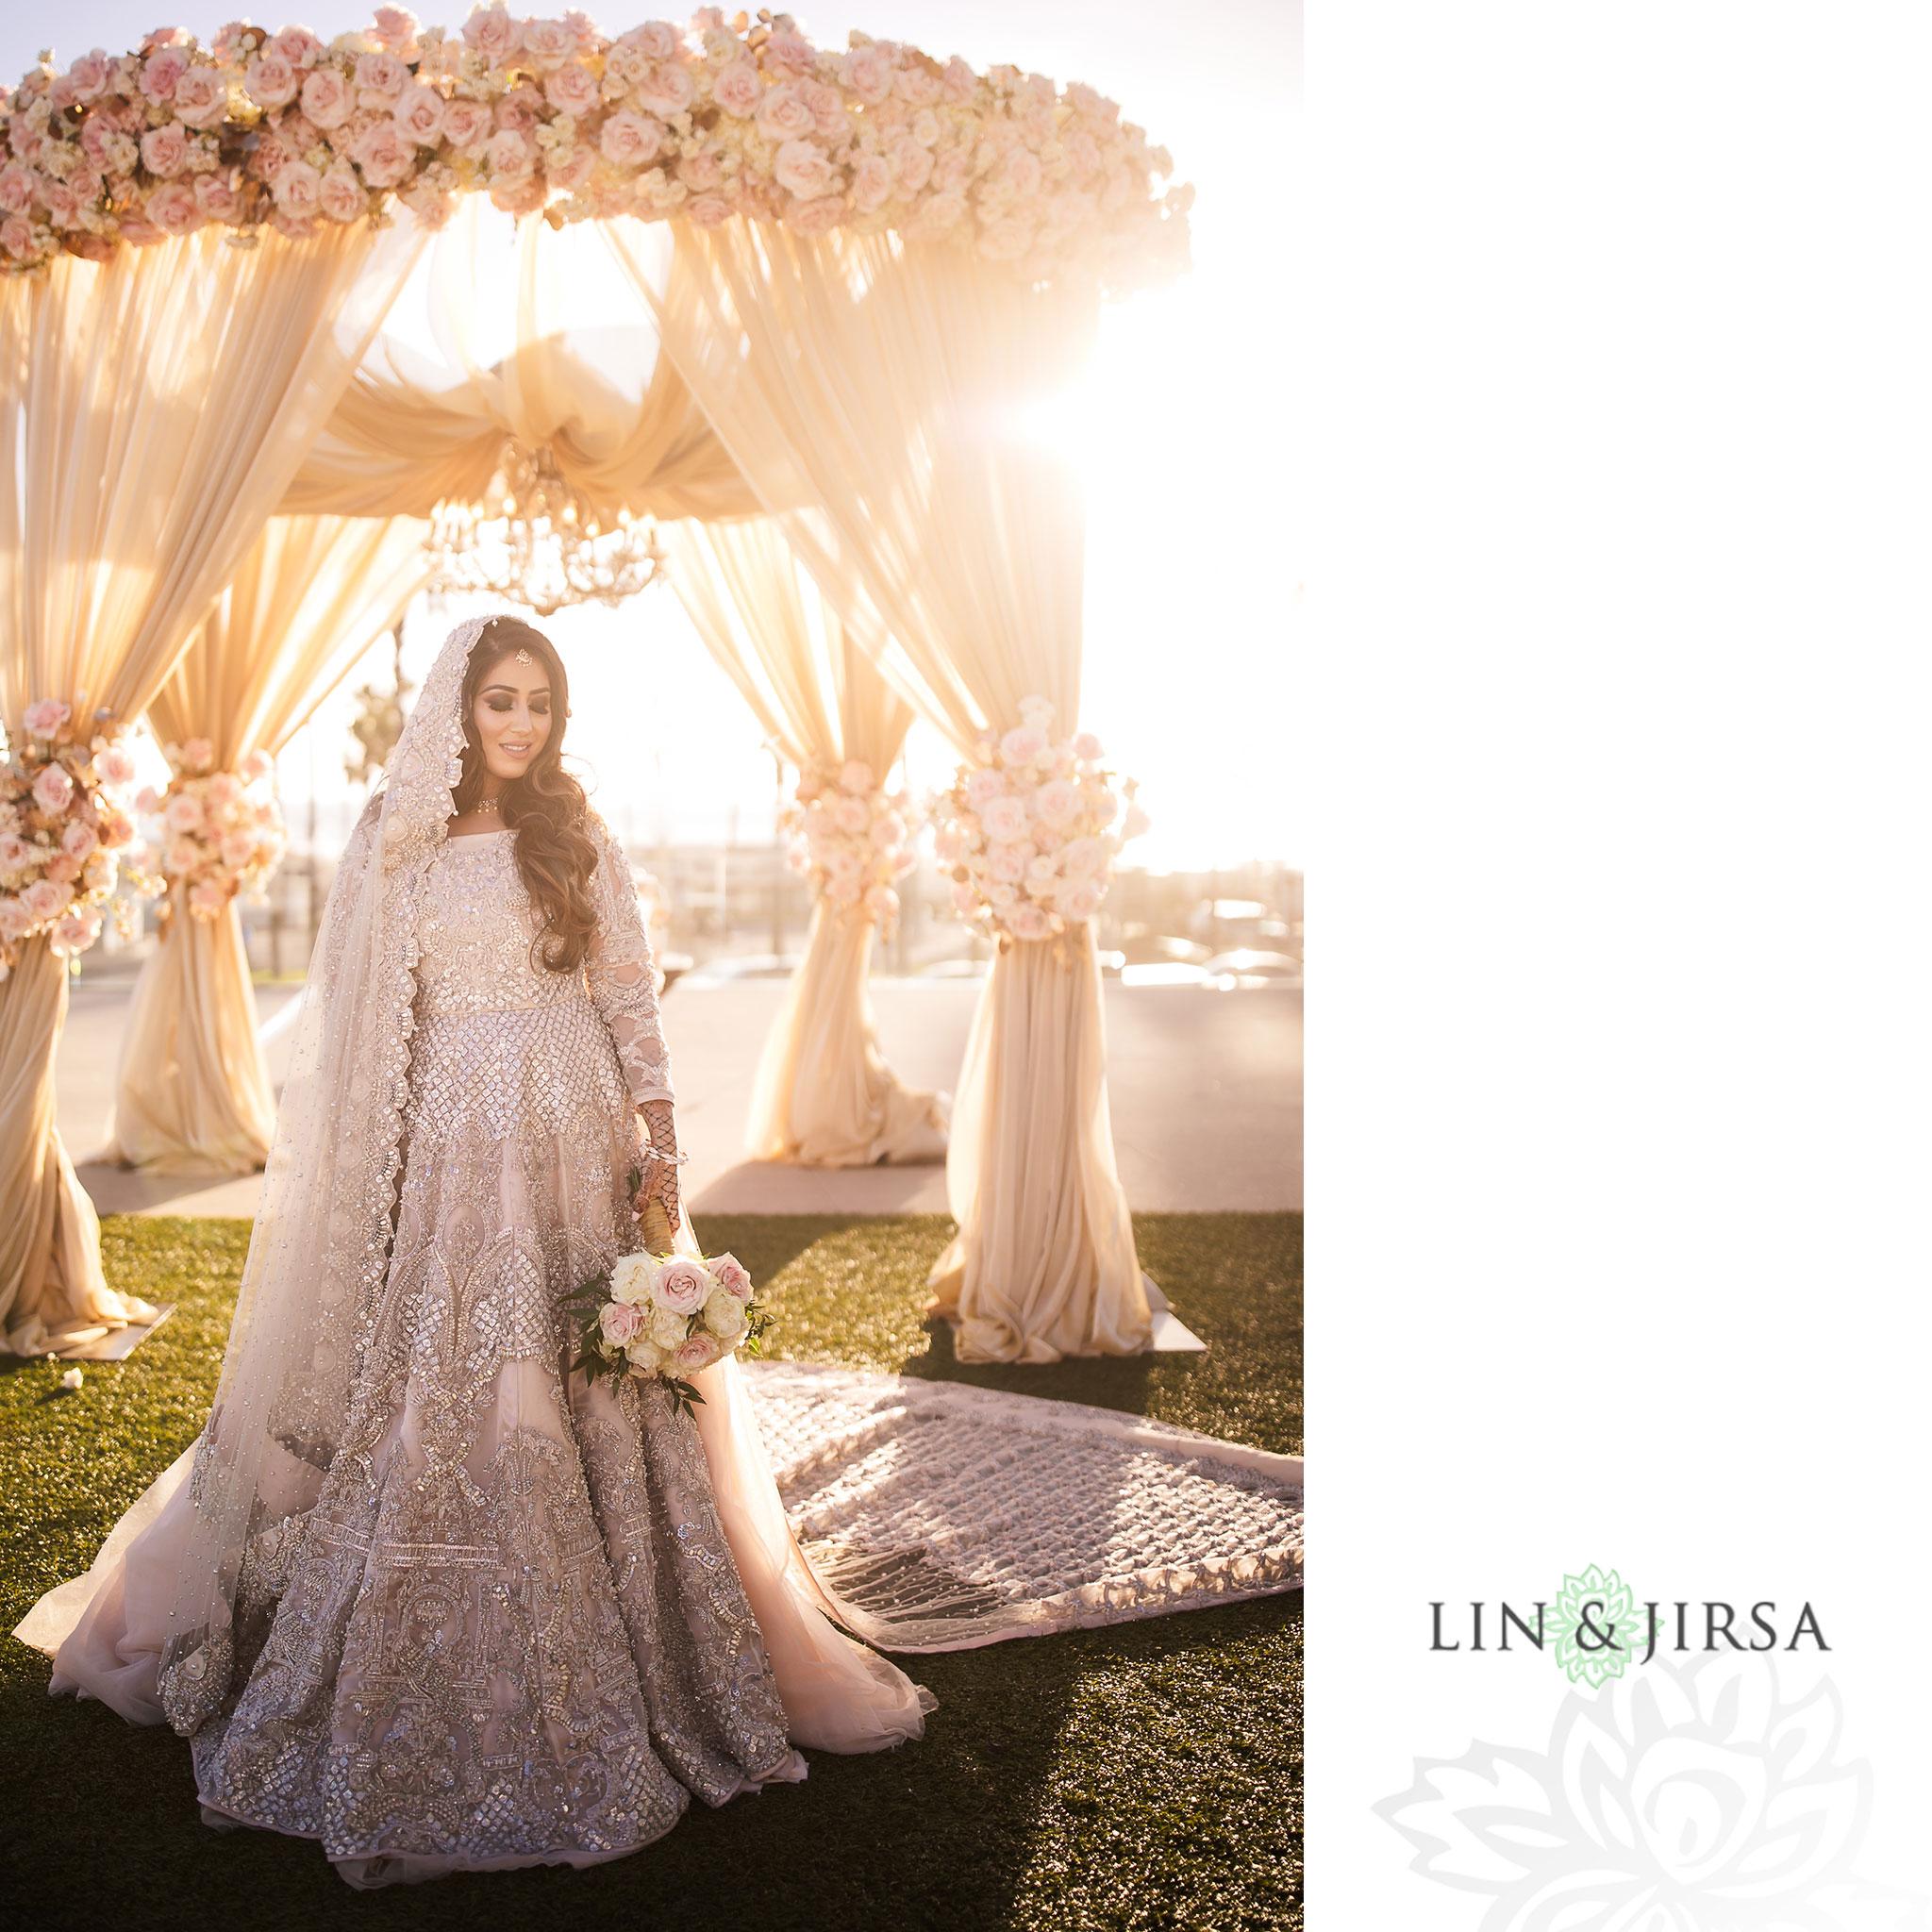 07 huntington beach pakistani bride erumkhan dress wedding photography